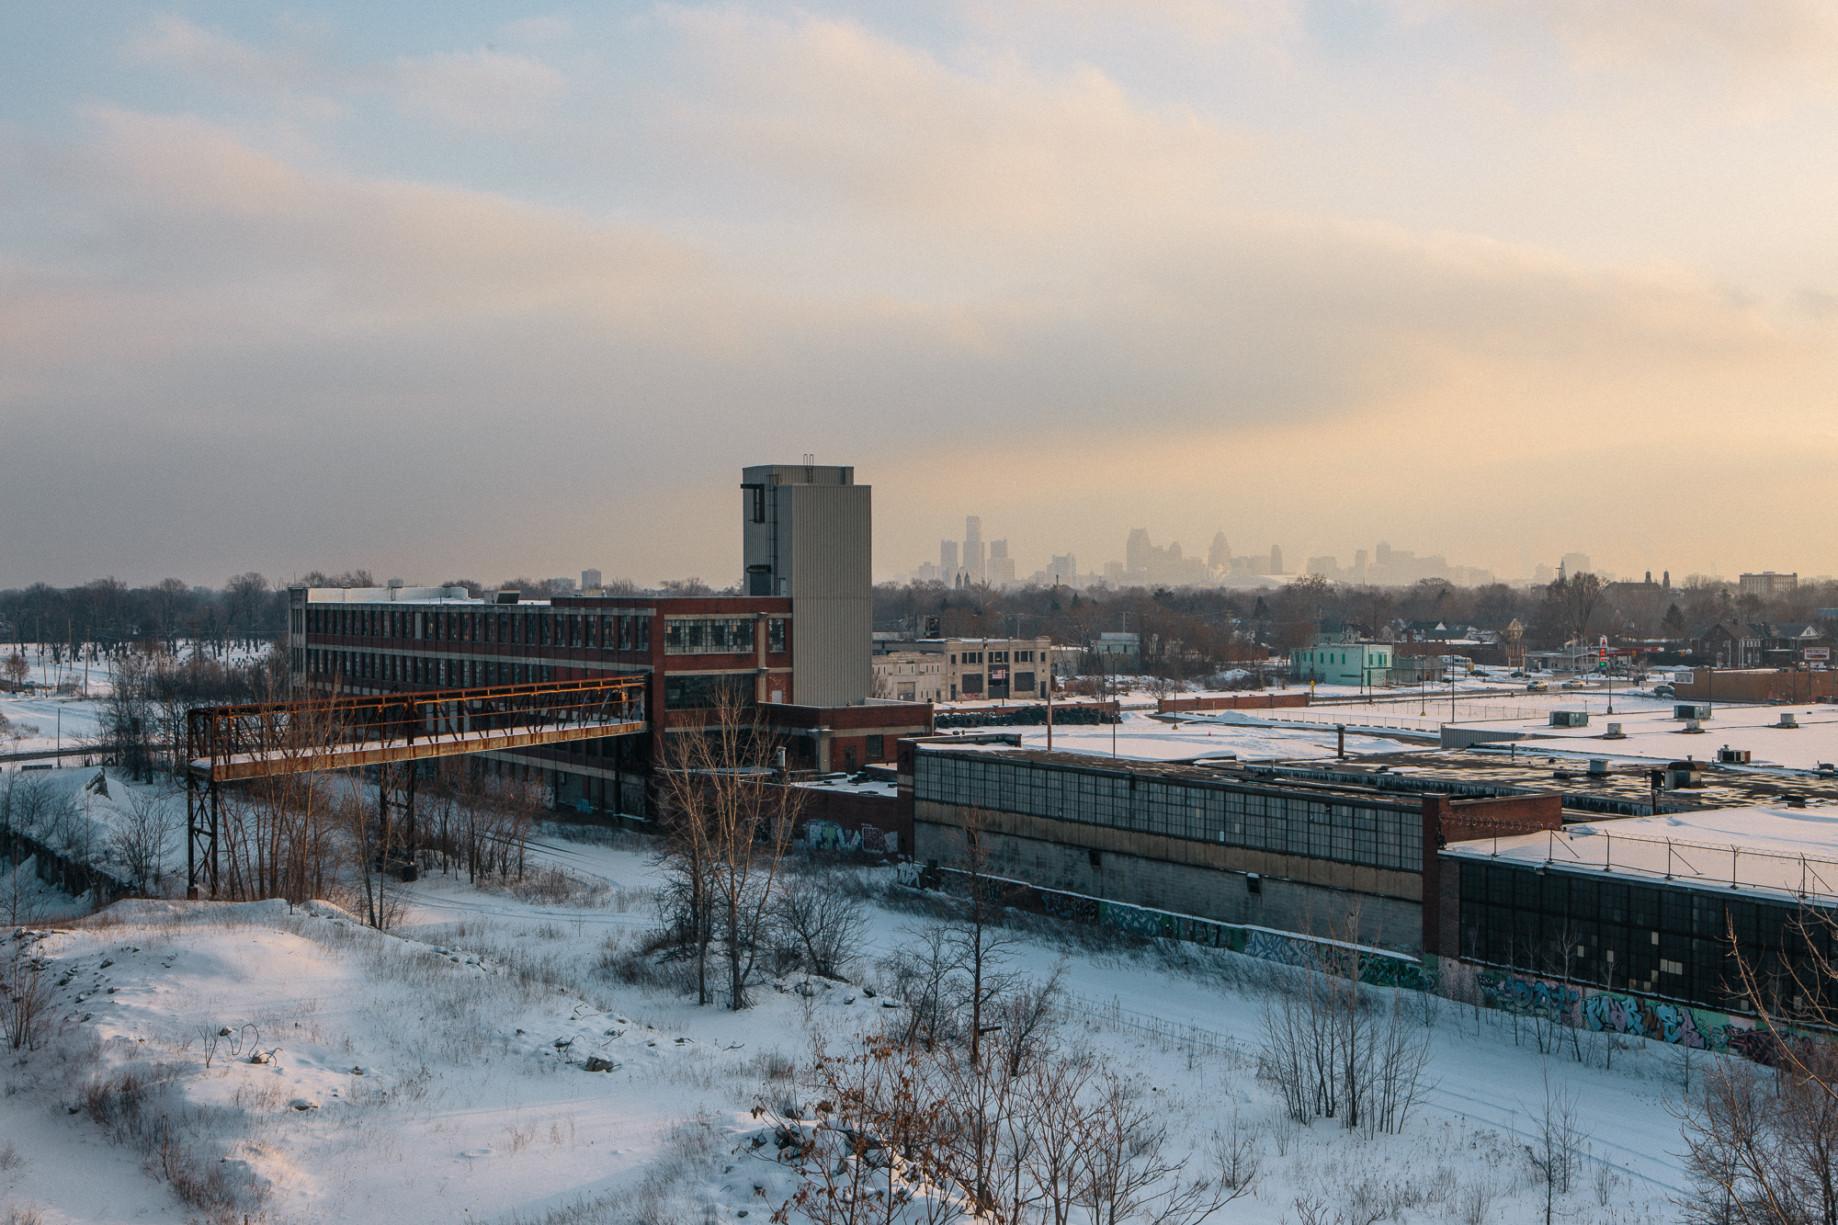 simonweller-frozenstates-packard